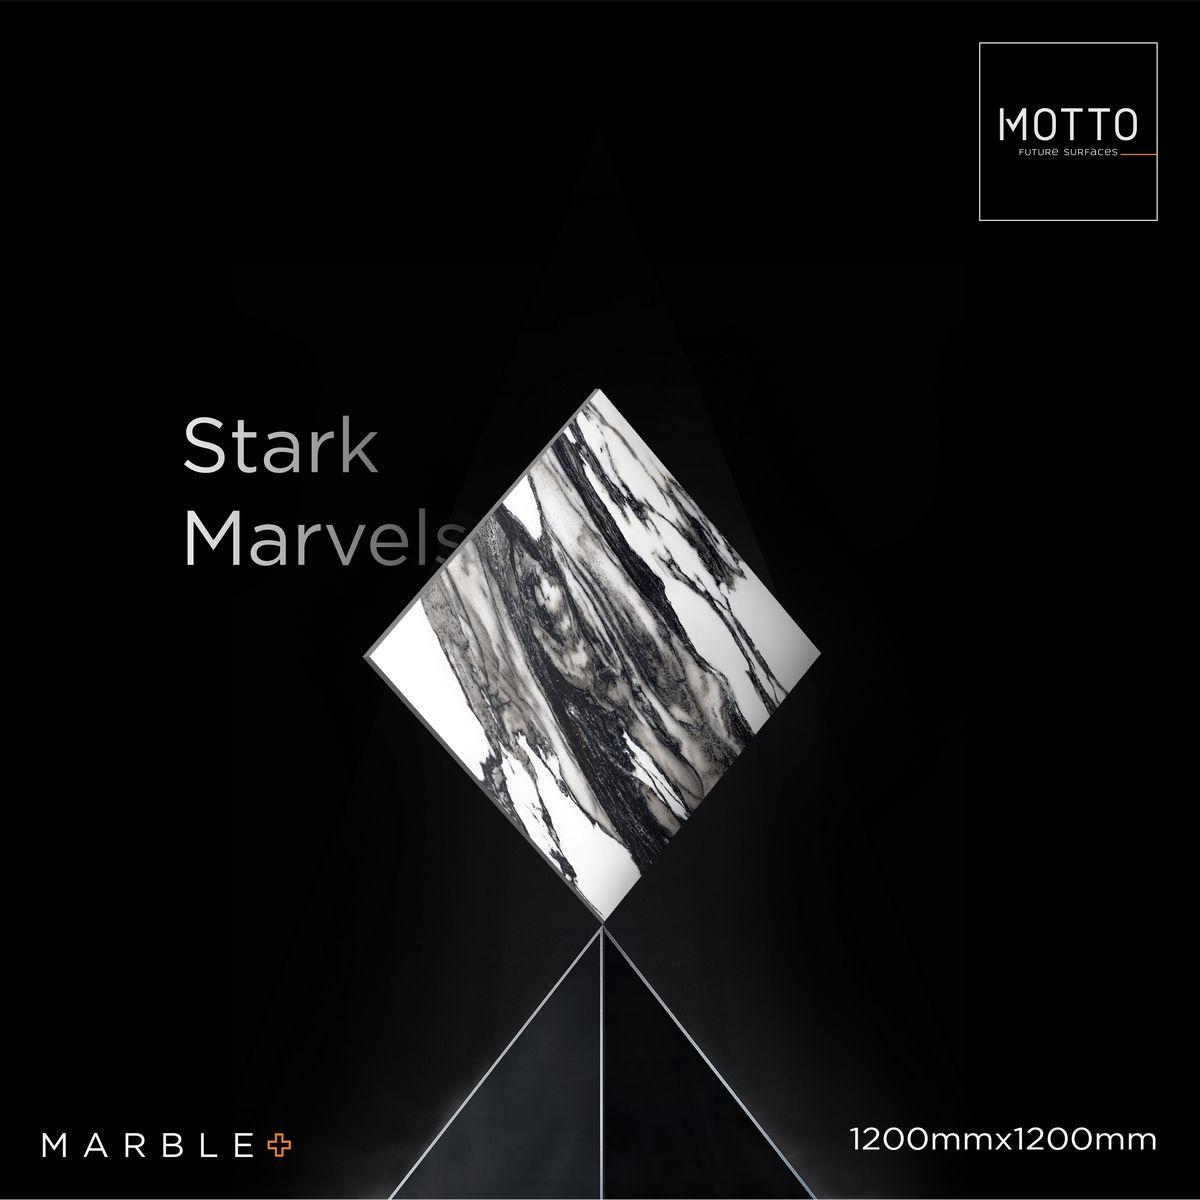 Stark Marvels Motto Tiles Mottogroup Ceramic Brand Floortiles Luxurydesign Interiordesign Slabtiles Slab Tile Slabtile Stark Marvel Luxury Design